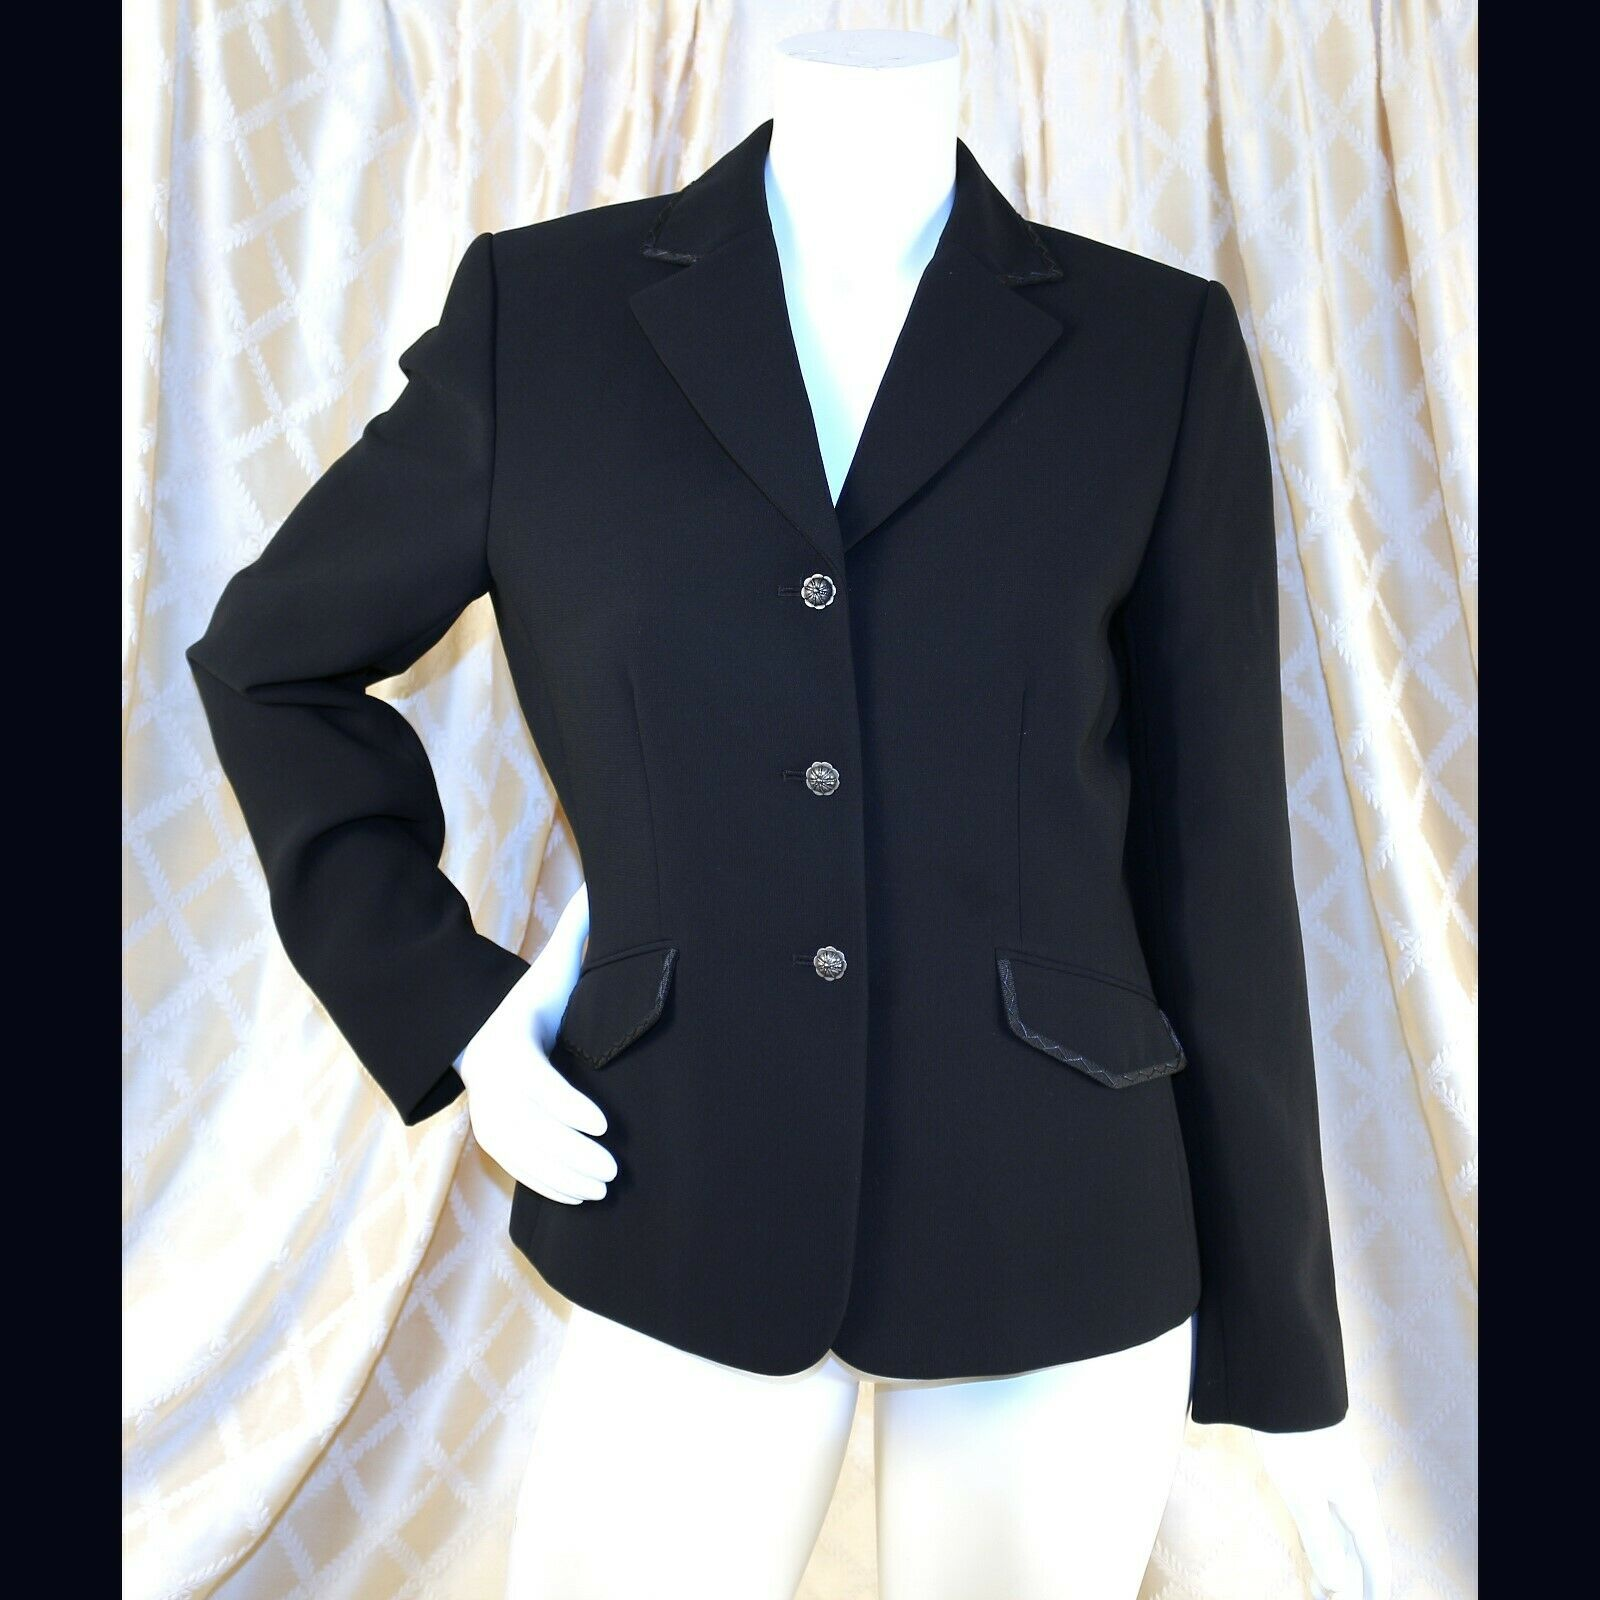 Tahari azul marino  con adorno geométrico Mujer Blazer Abrigo Chaqueta  buen precio